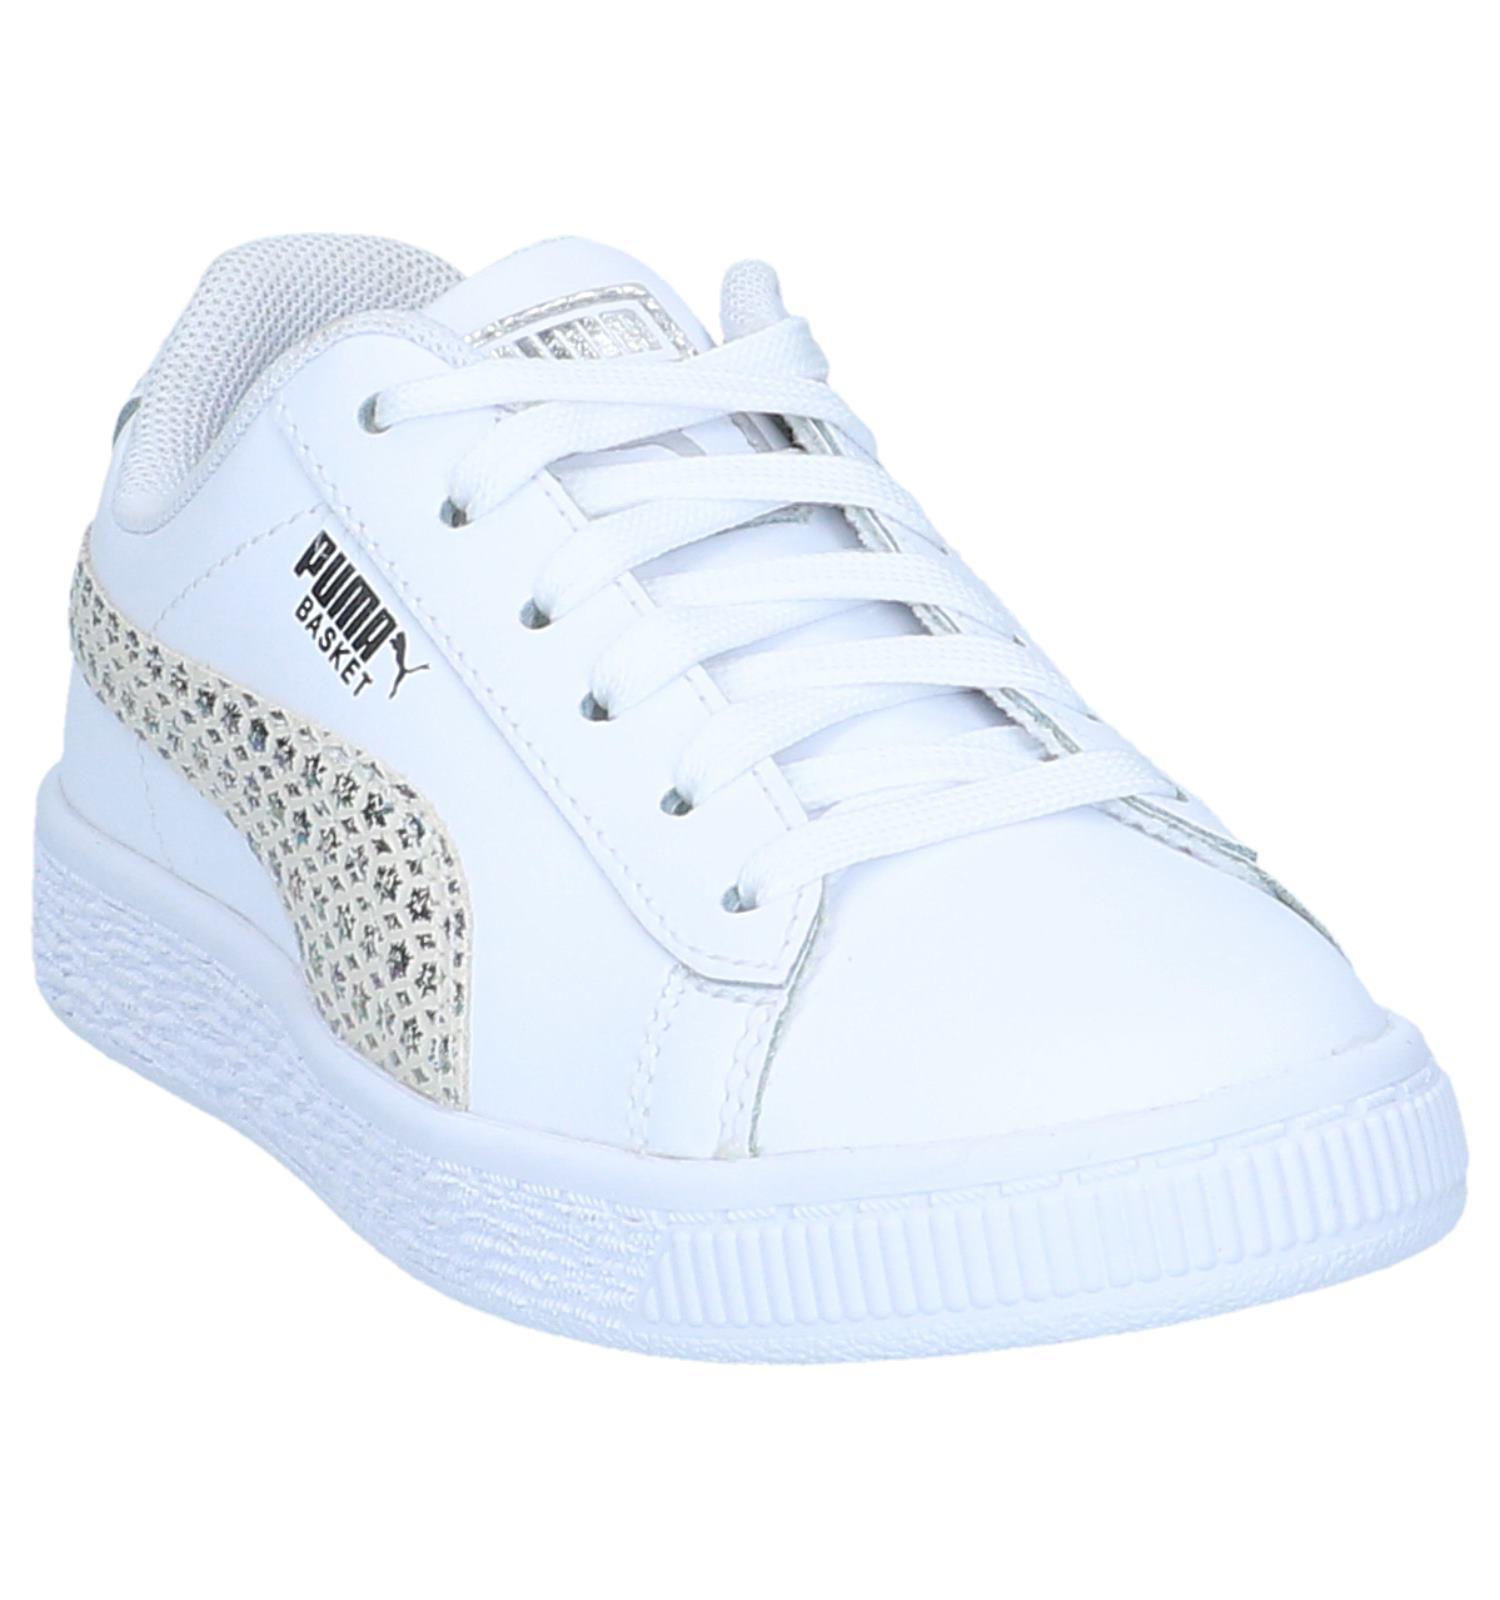 e95bacd5e3b Witte Sneakers Puma Basket Chameleon   TORFS.BE   Gratis verzend en retour